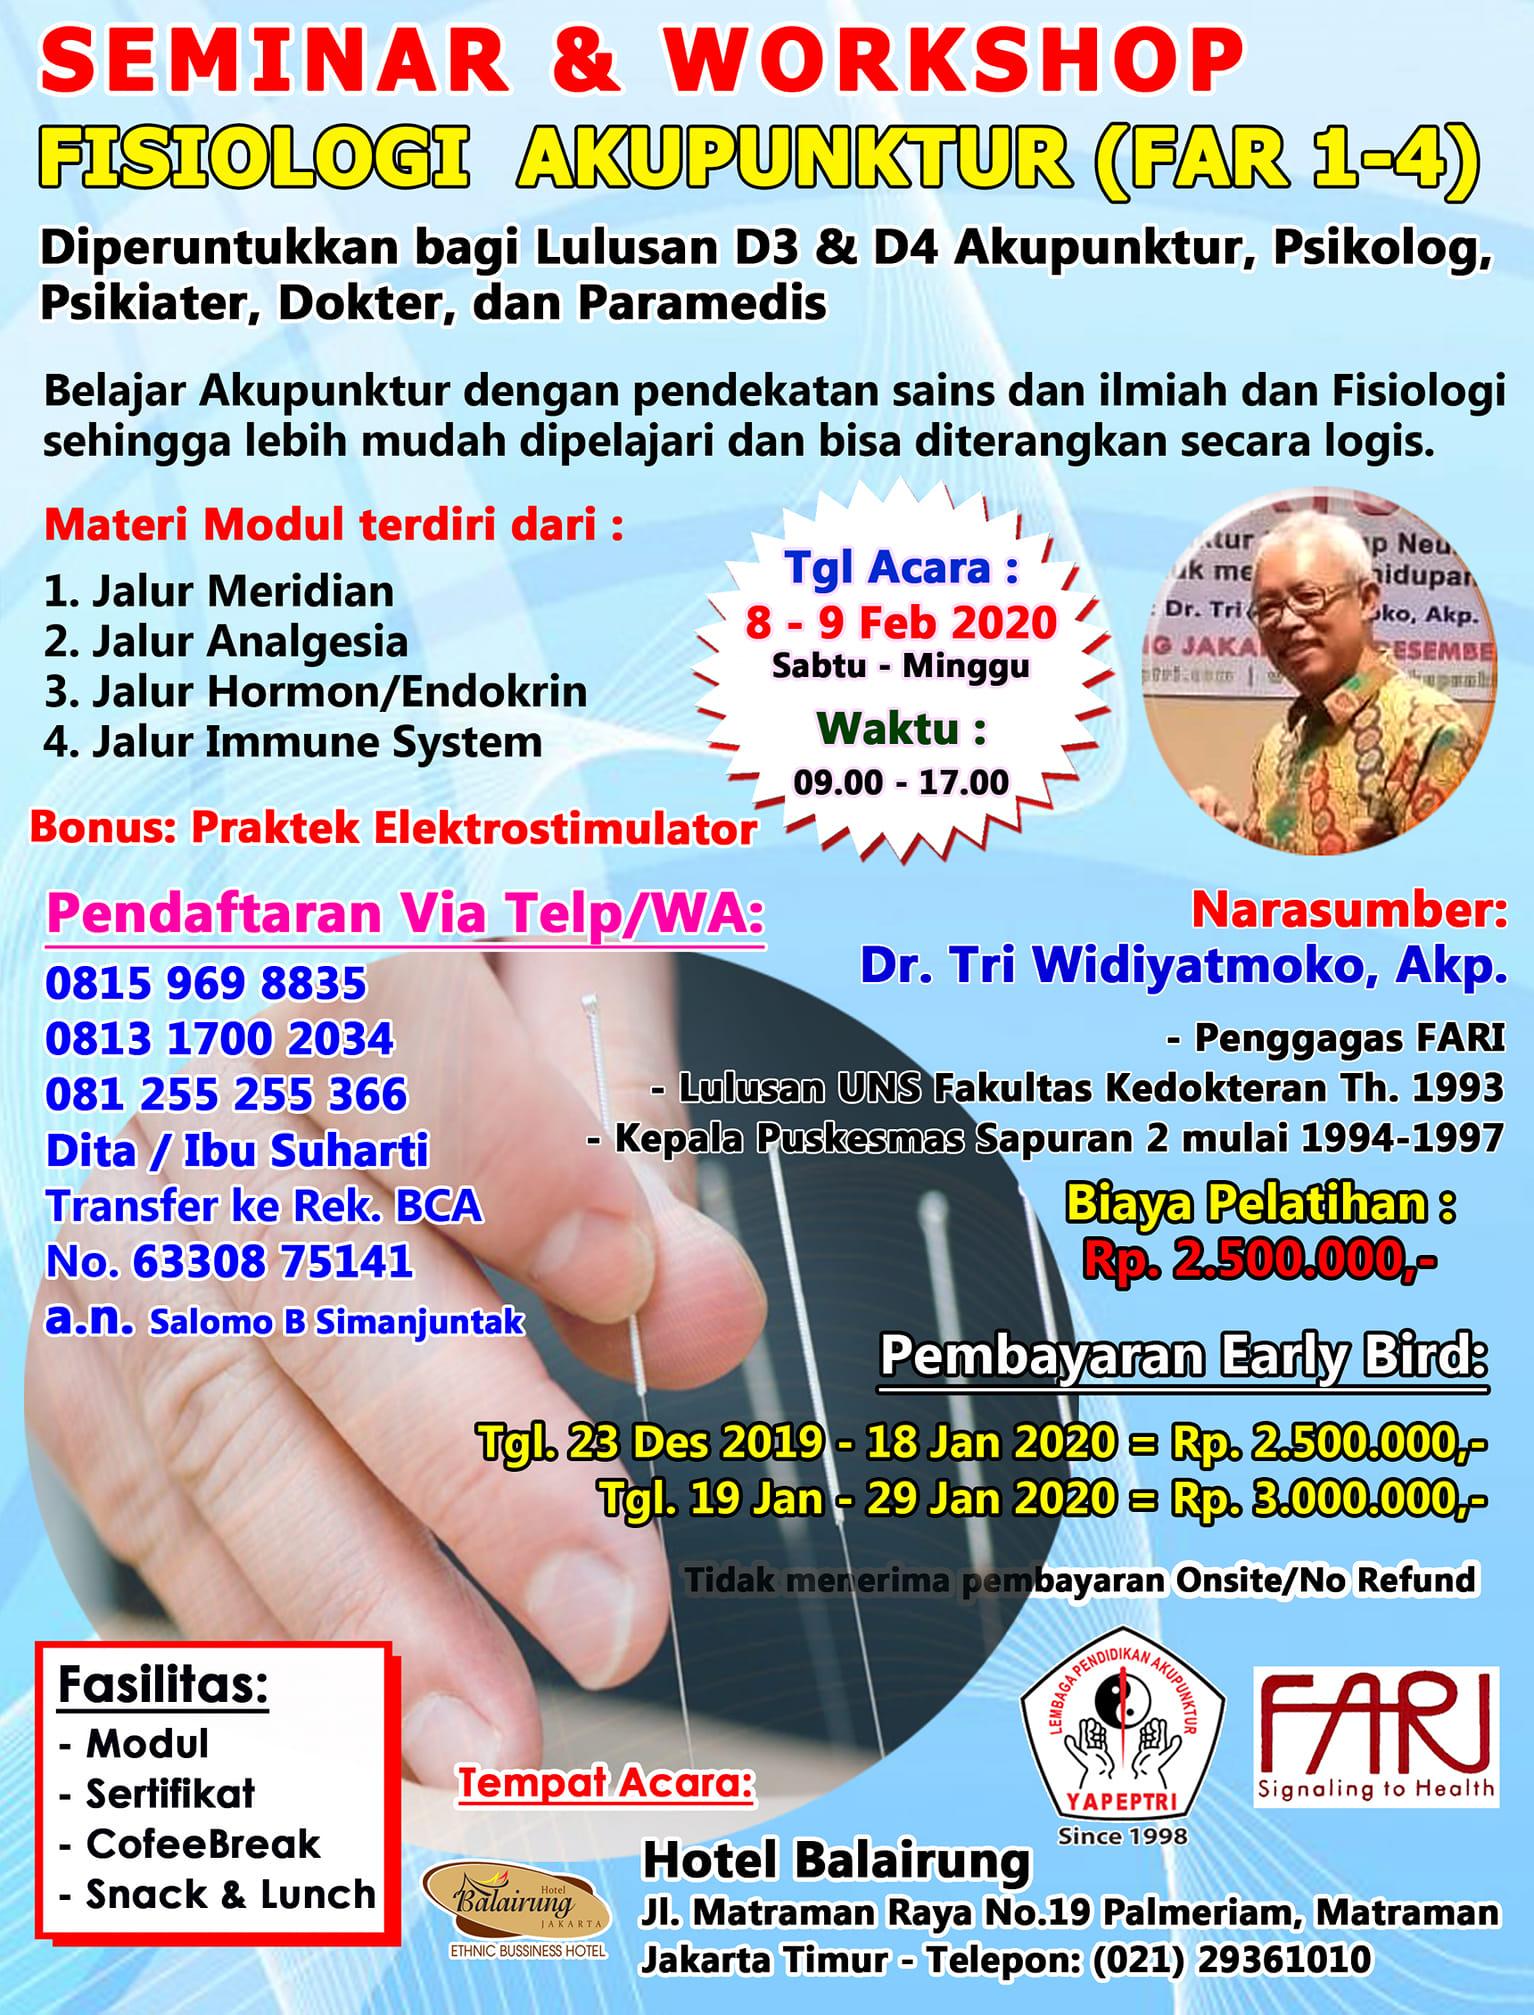 Nama-nama peserta seminar & workshop Fisiologi Akupunktur (FAR 1-4)